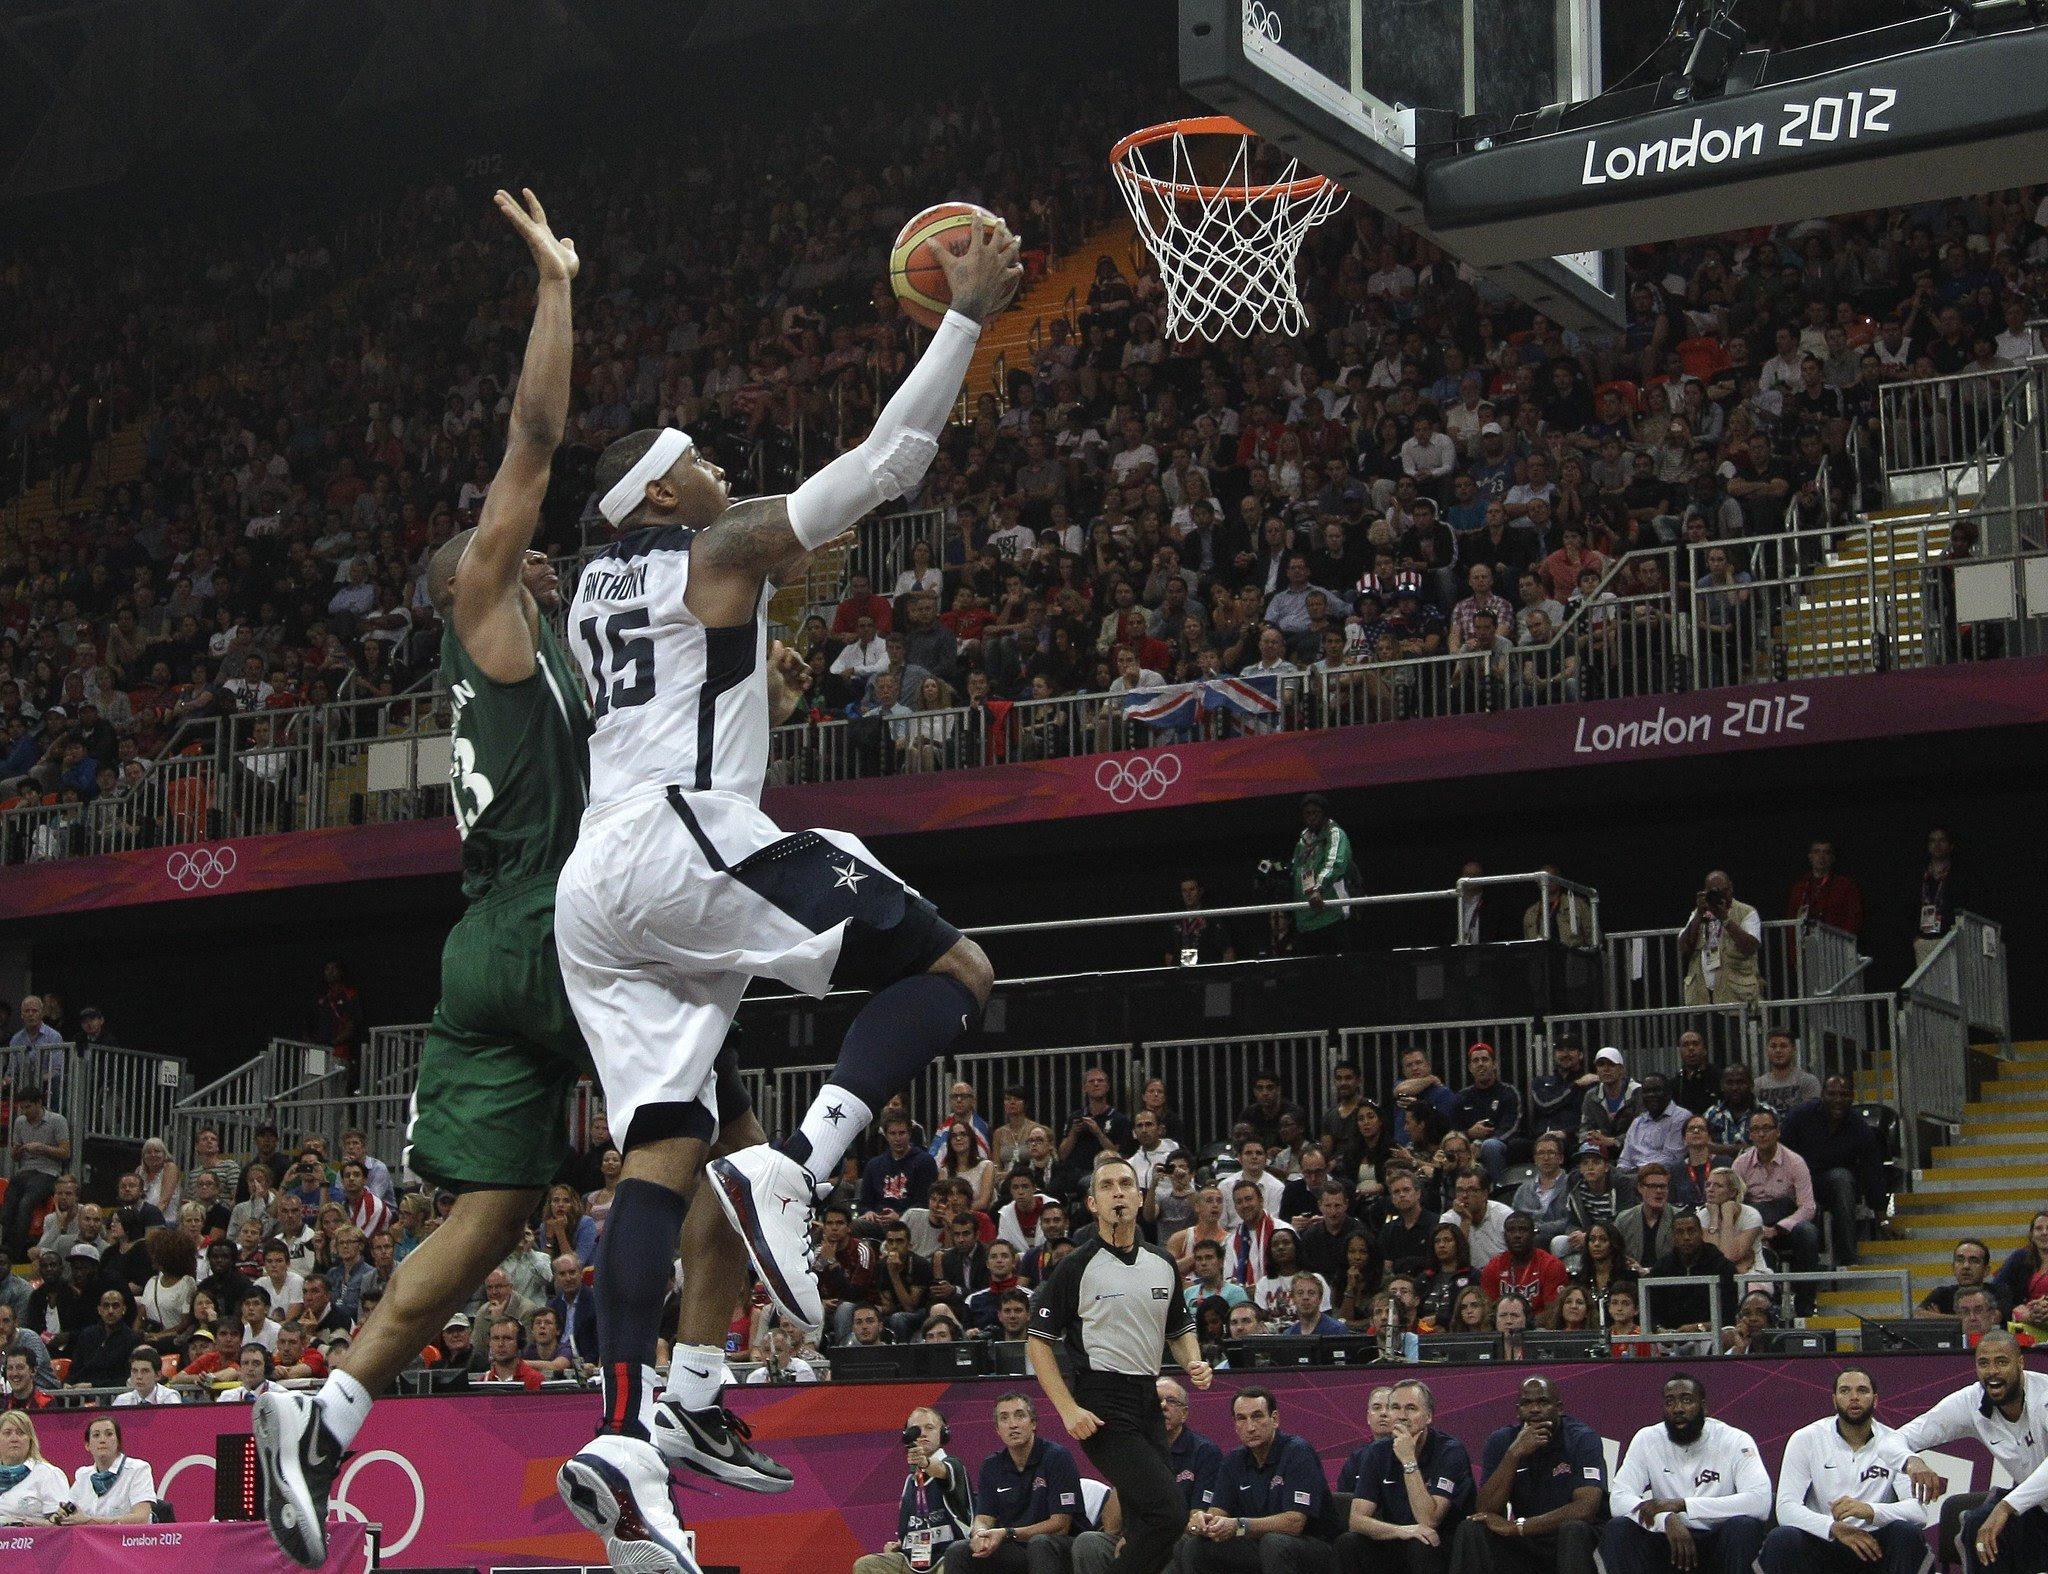 Olympic Games 2012 Basketball